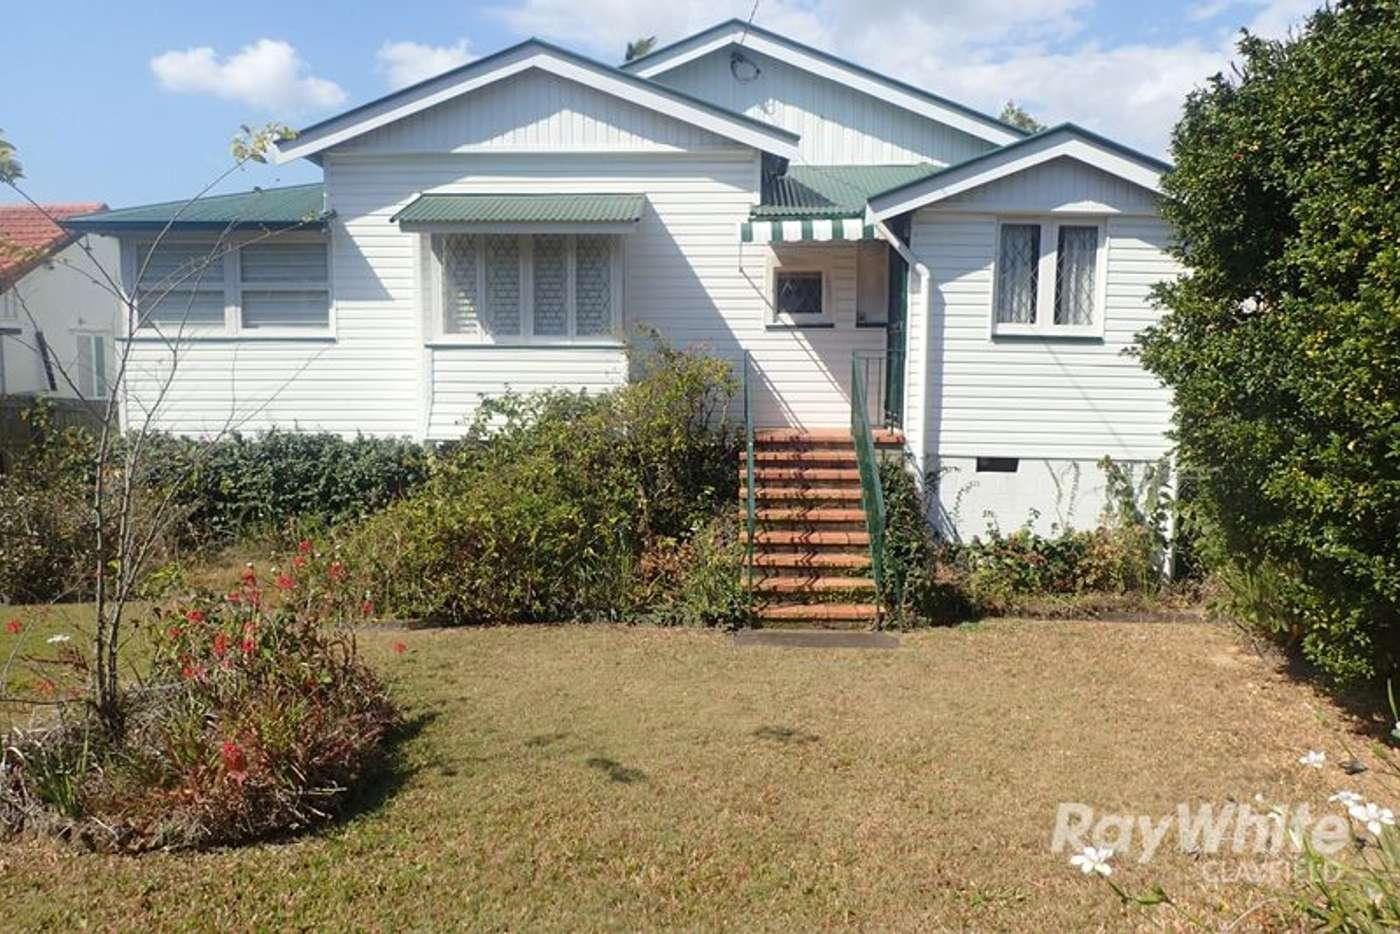 Main view of Homely house listing, 1 Charlton Street, Hamilton QLD 4007